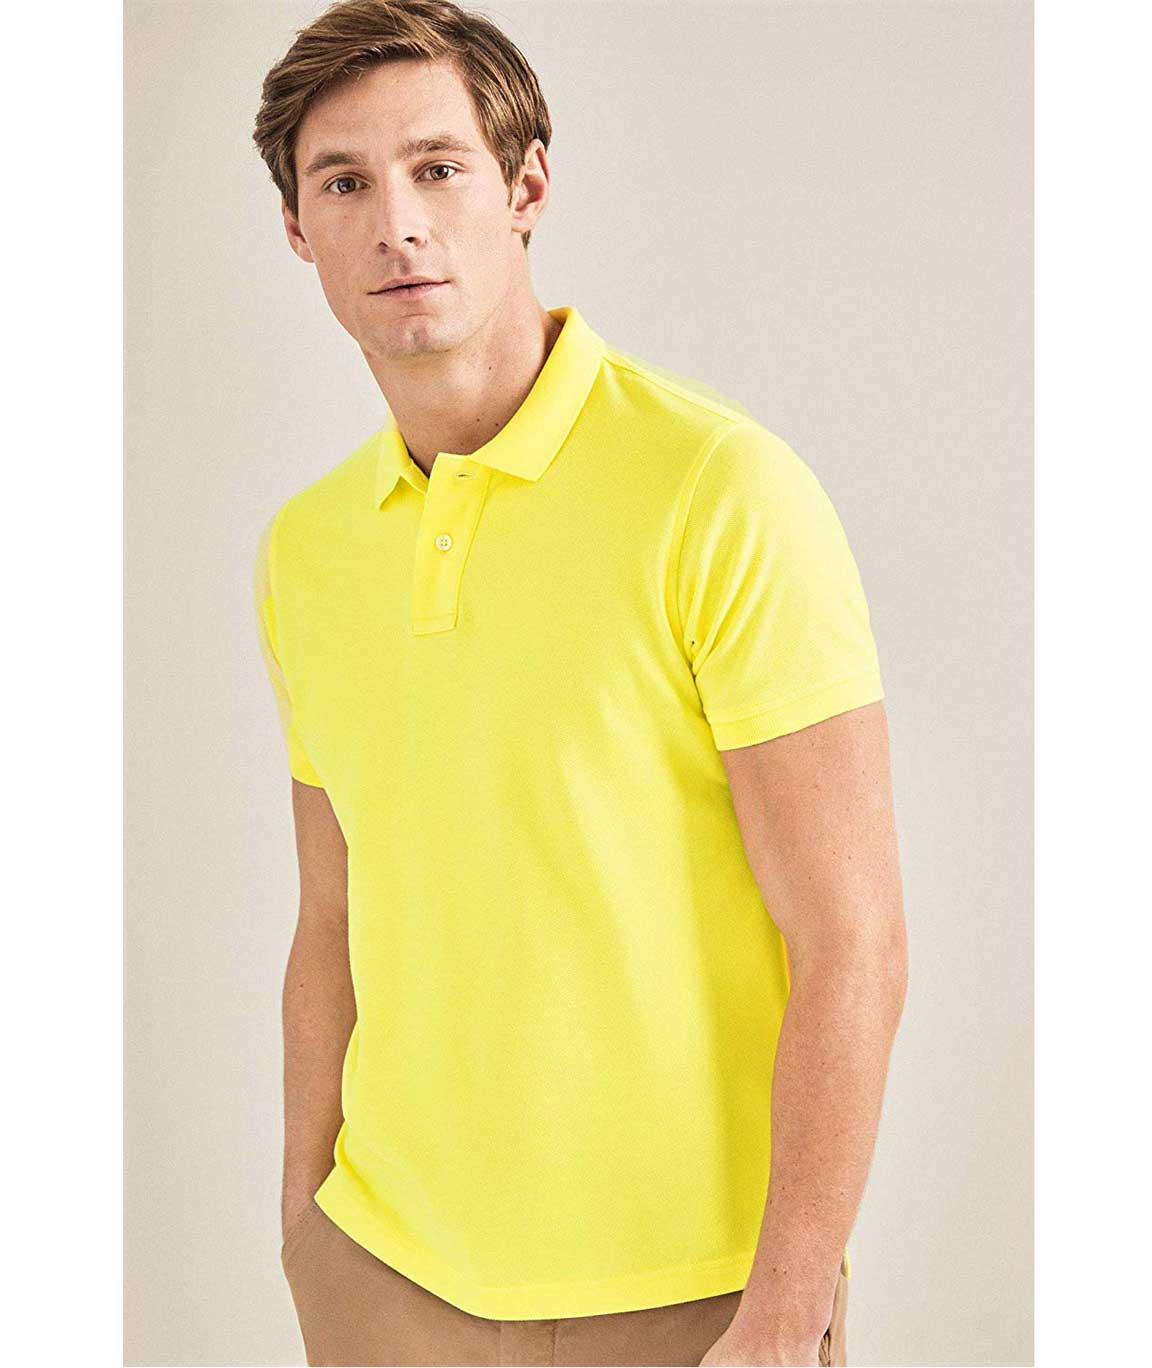 Vestiario Men`s Polo Neck T-Shirt by H2K Enterprises/Men`s Cotton Blended T-Shirts/Reasonable Price